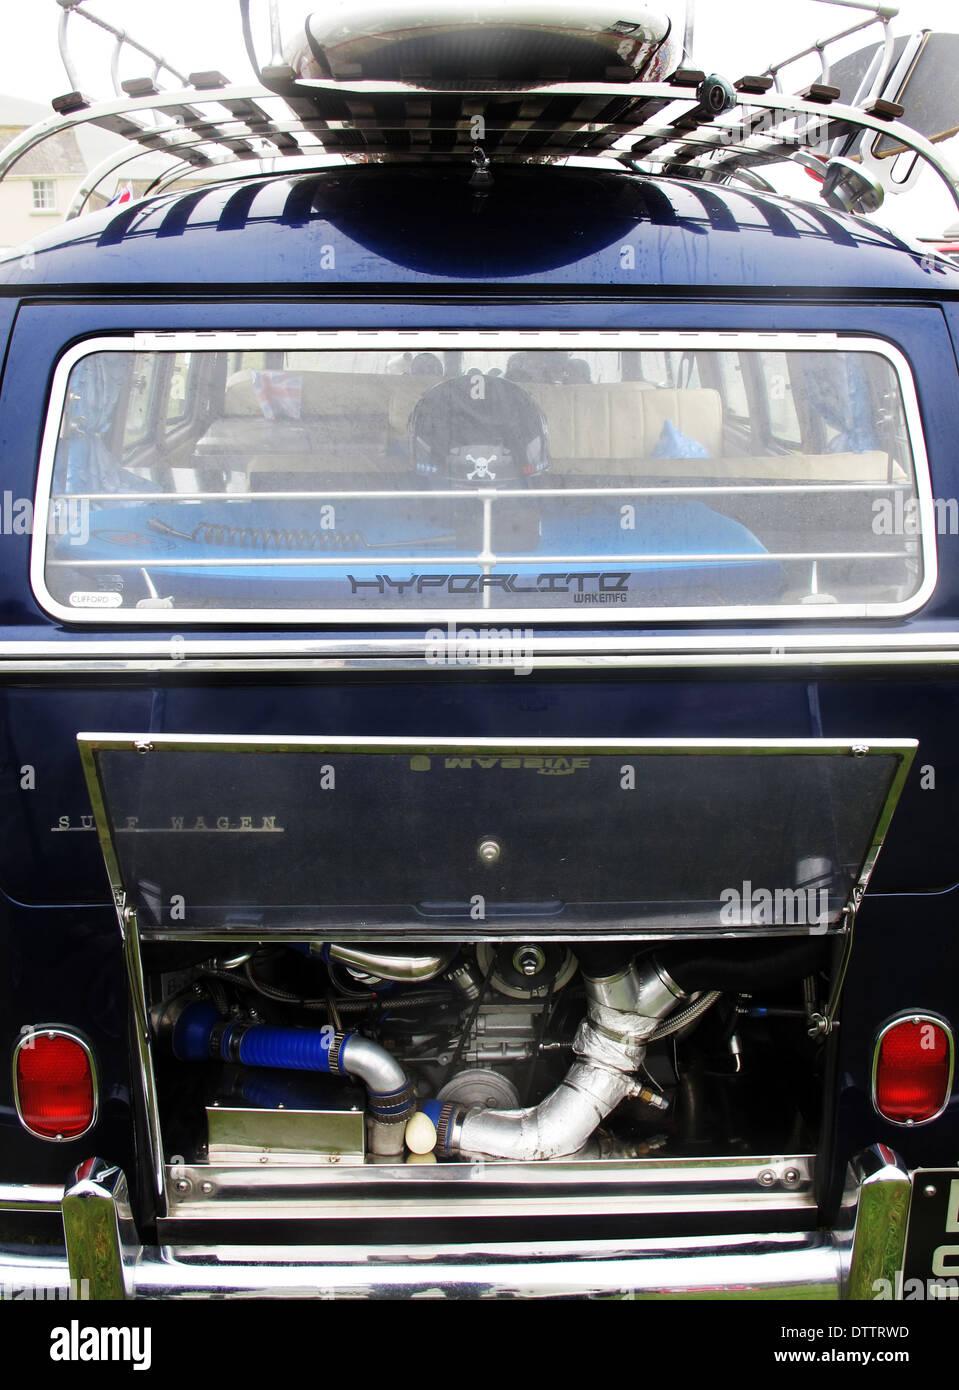 VW Camper Van - Stock Image